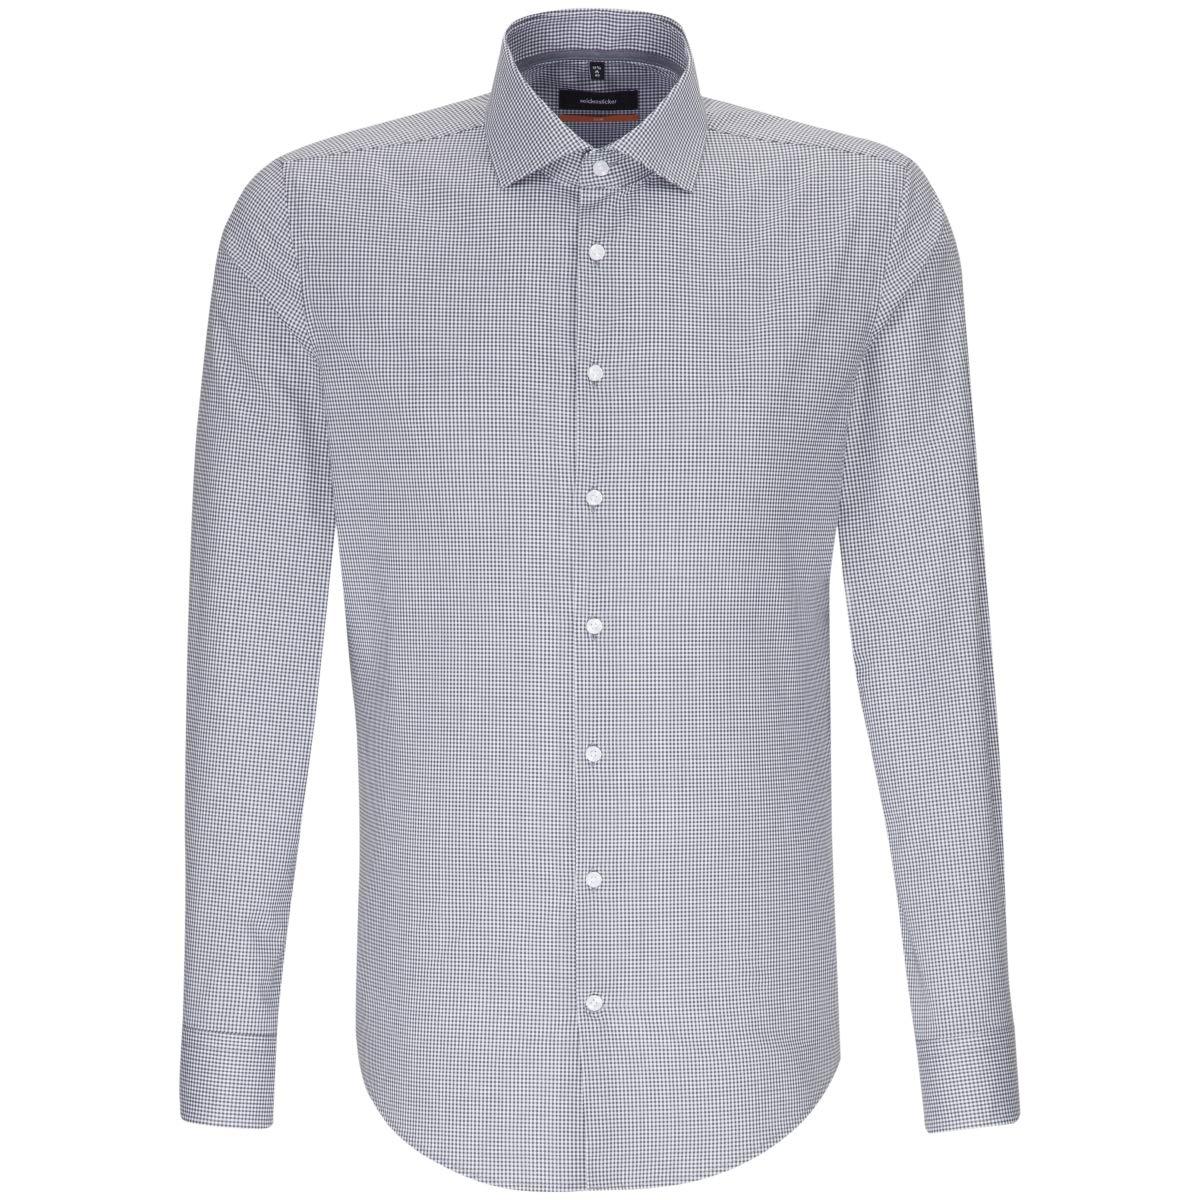 Seidensticker - Camisa Formal - Cuadros - Clásico - para Hombre